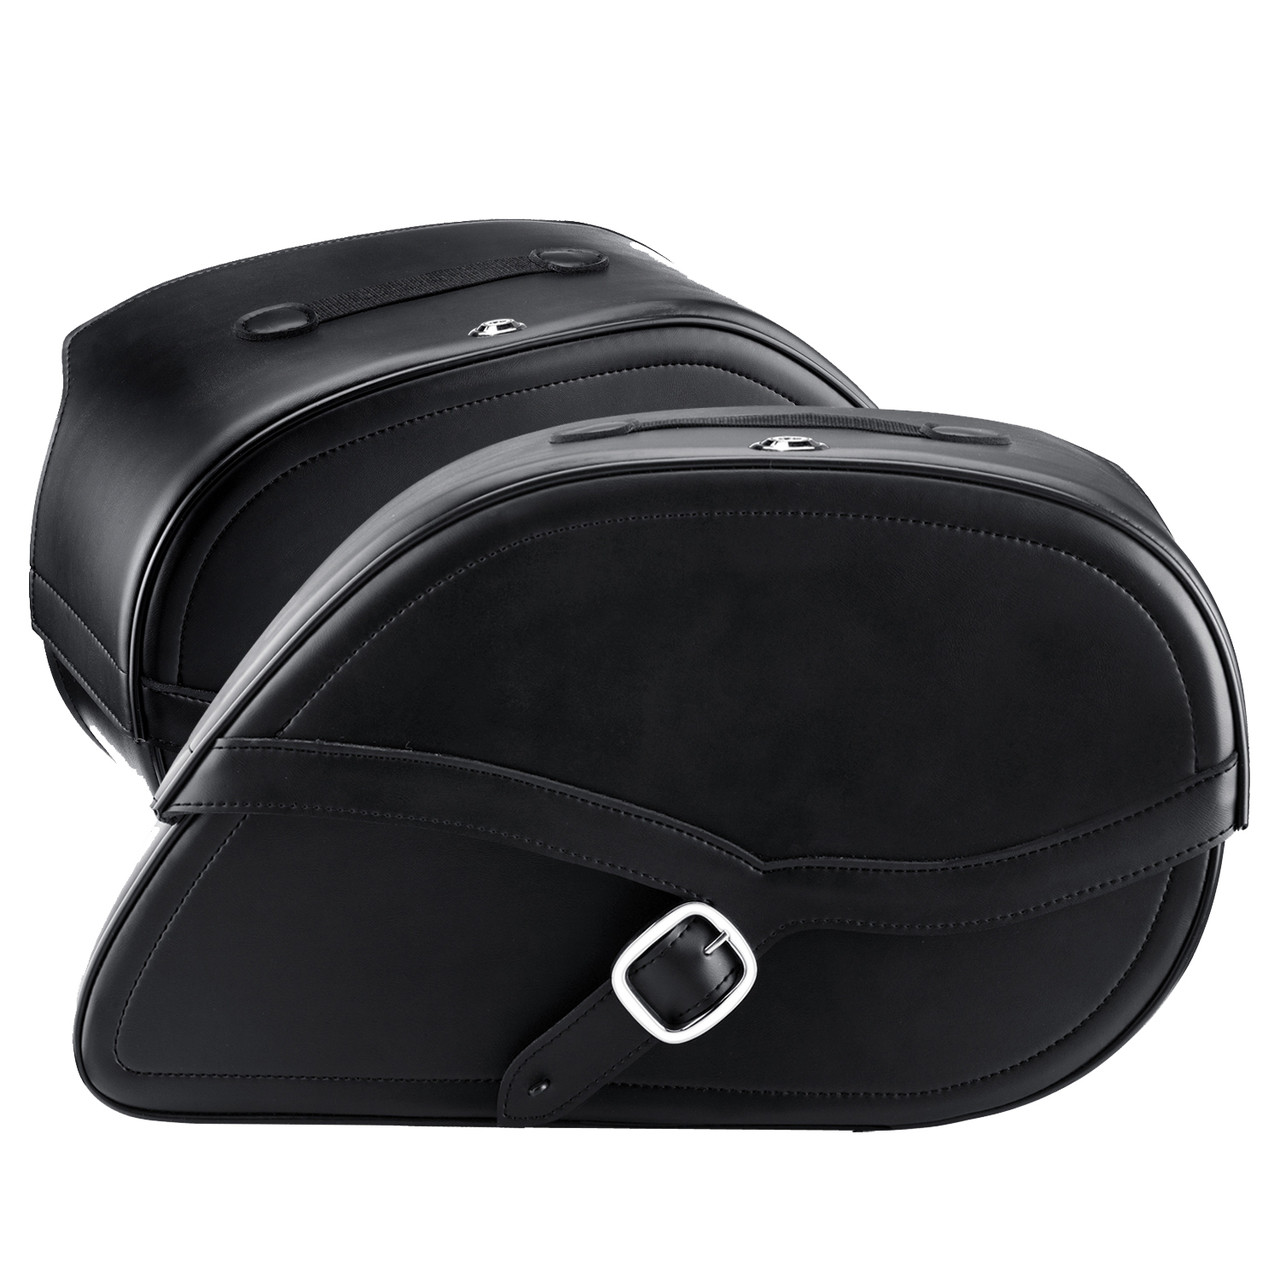 Viking Armor Shock Cutout Motorcycle Saddlebags Both Bags View